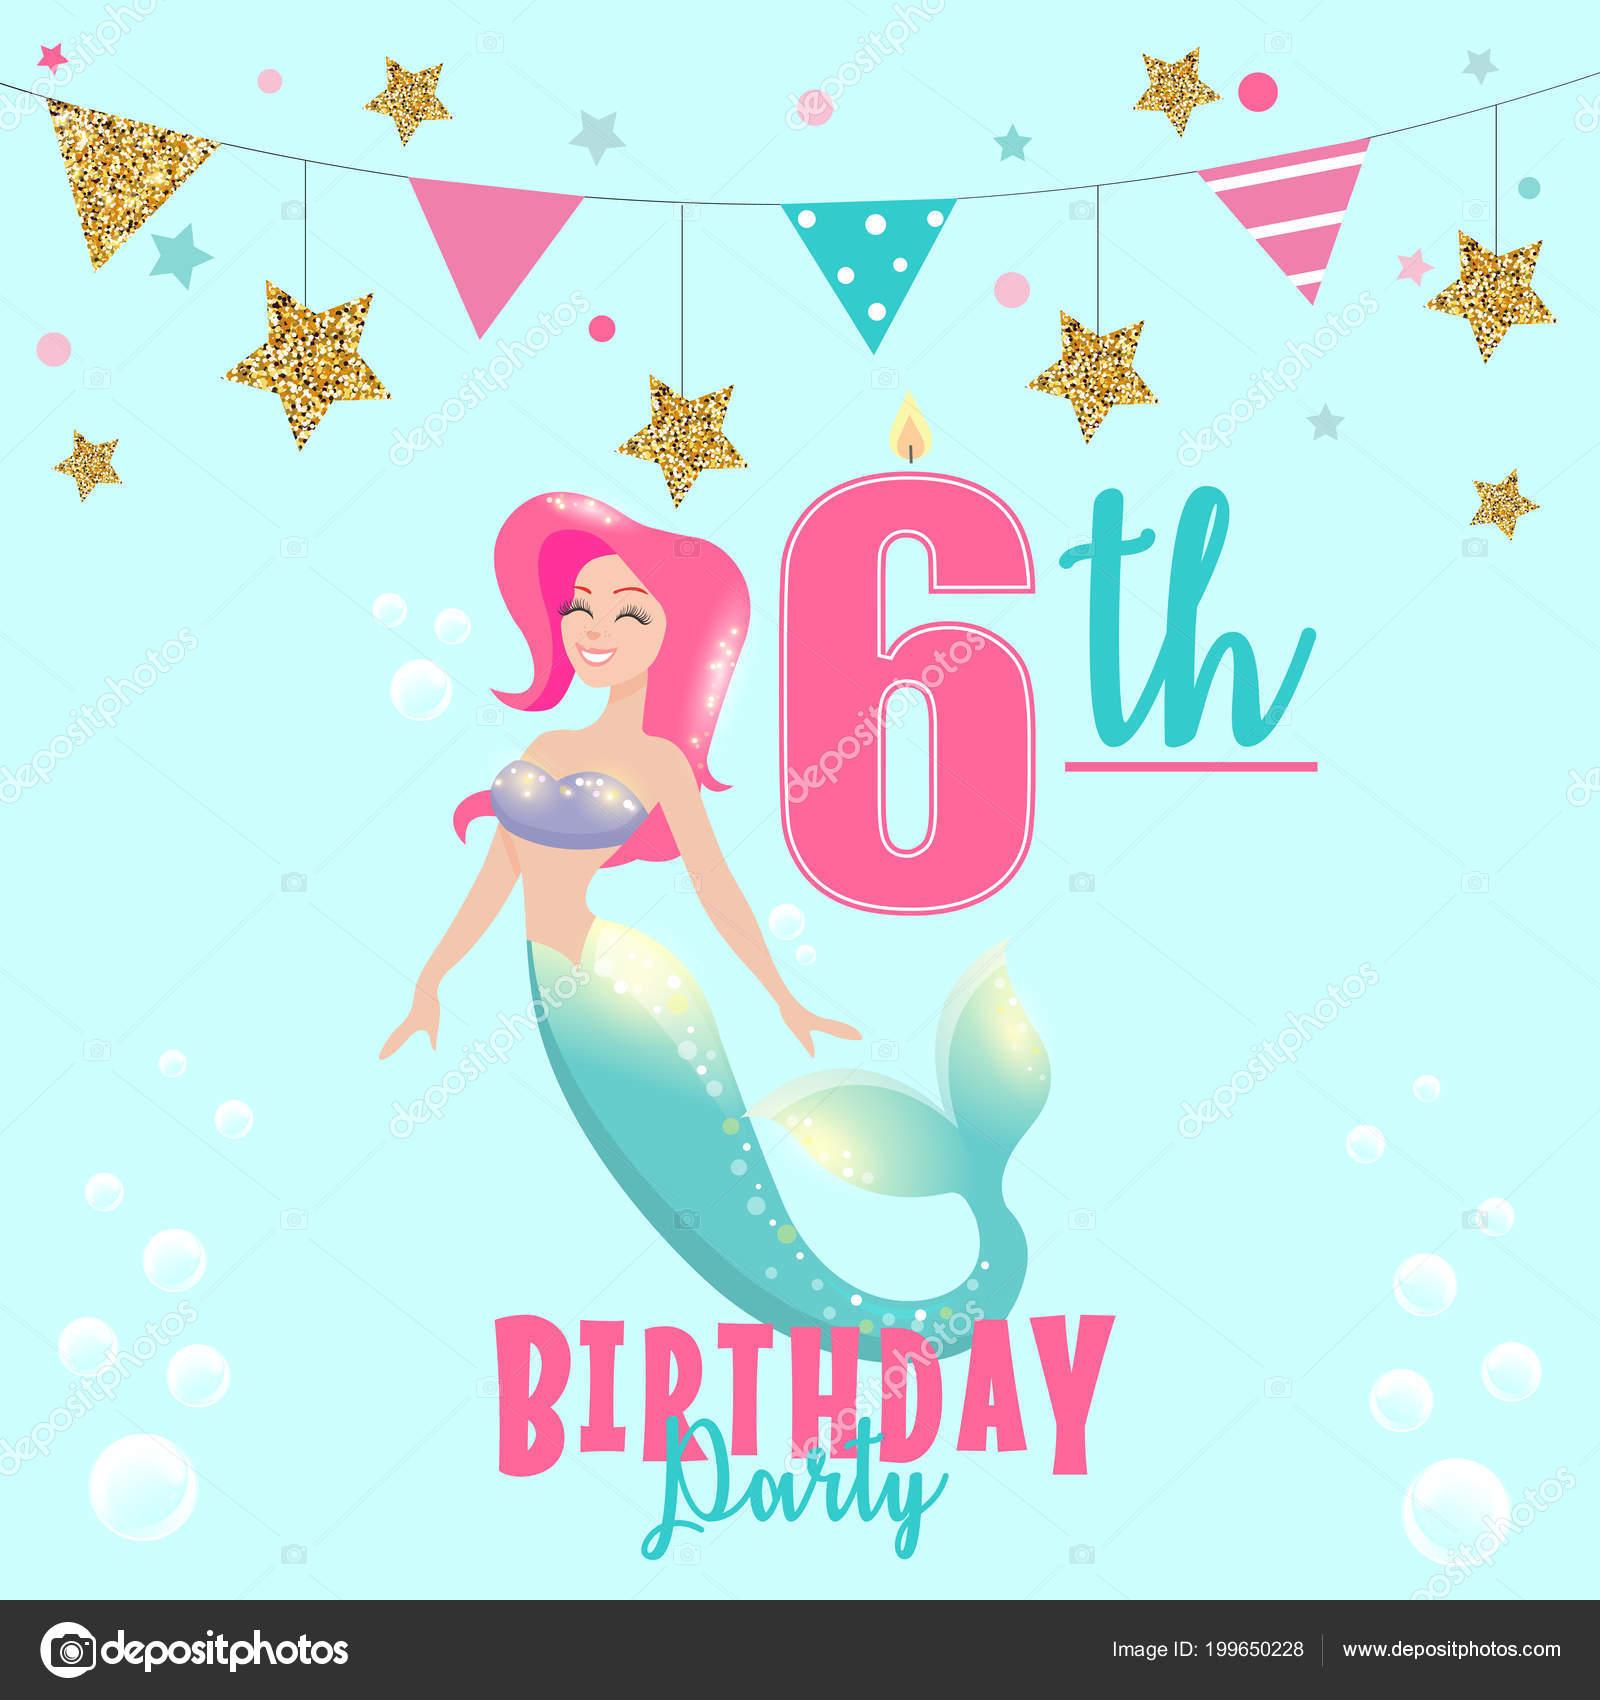 Colorful Vector Template 6th Birthday Party Invitation Mermaid Vector Image By C Elenabaryshkina Vector Stock 199650228